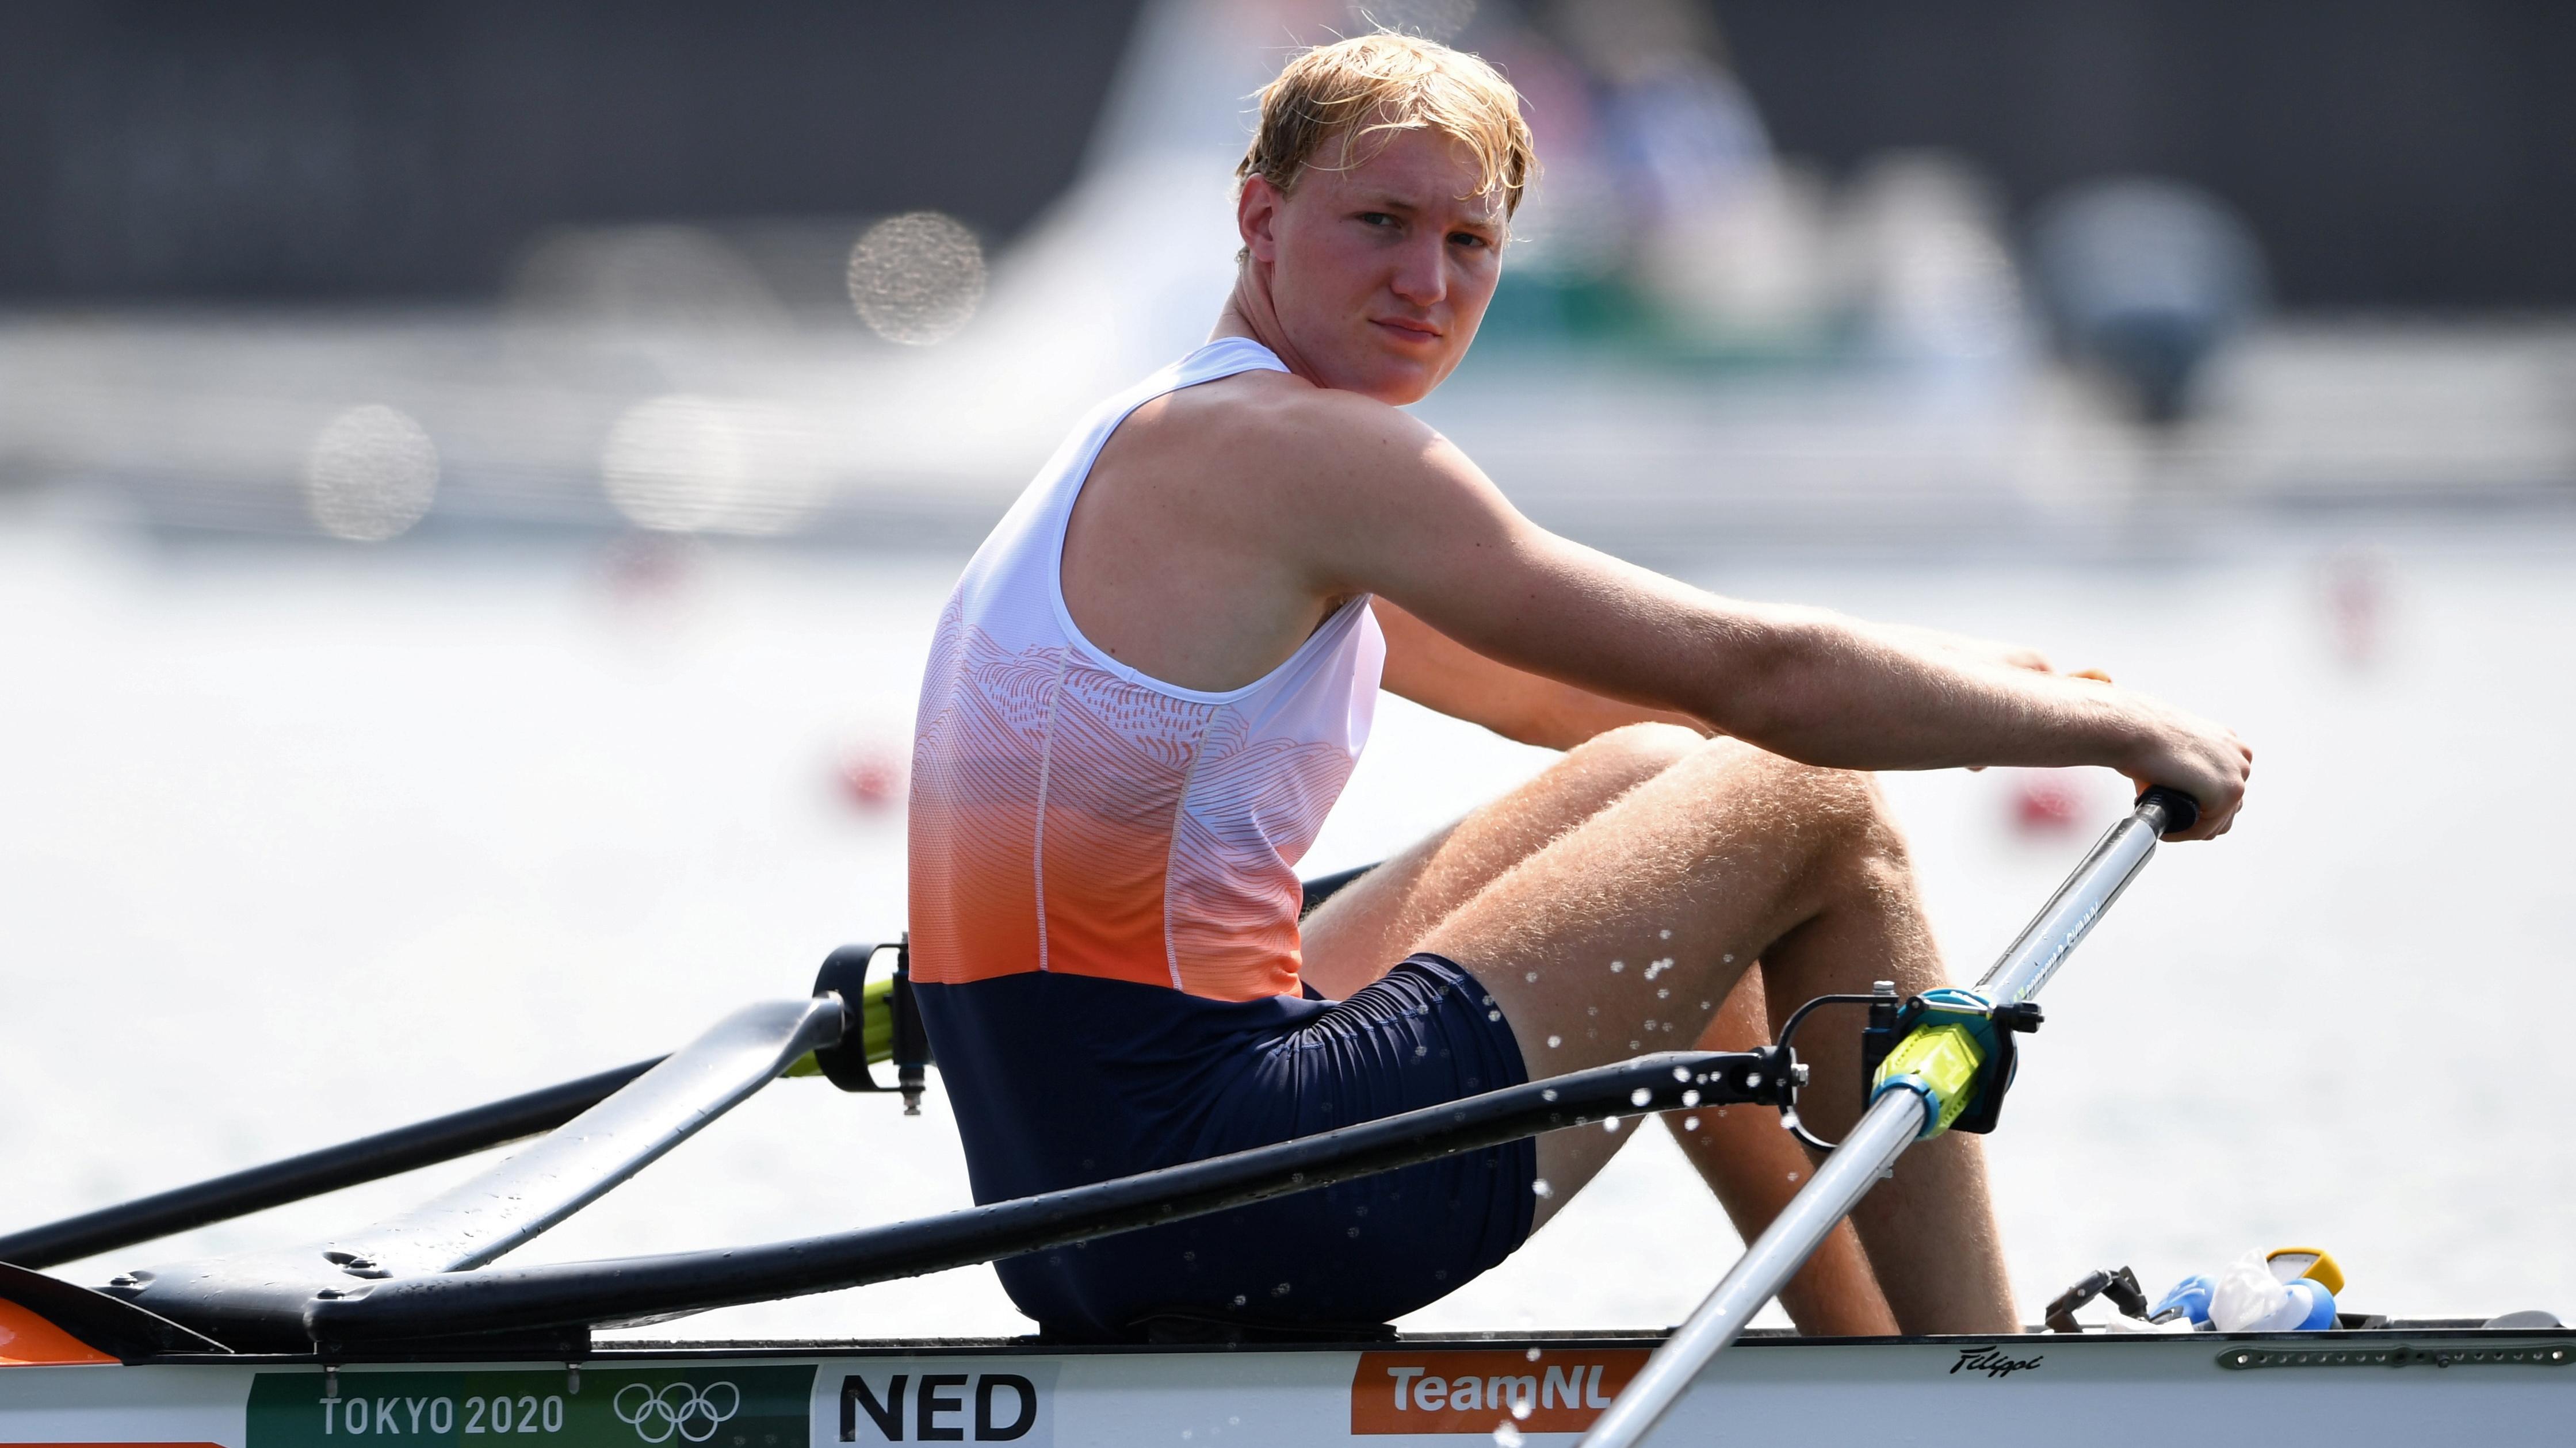 Tokyo 2020 Olympics - Rowing - Men's Single Sculls - Heats - Sea Forest Waterway, Tokyo, Japan - July 23, 2021. Finn Florijn of the Netherlands before competing REUTERS/Piroschka Van De Wouw